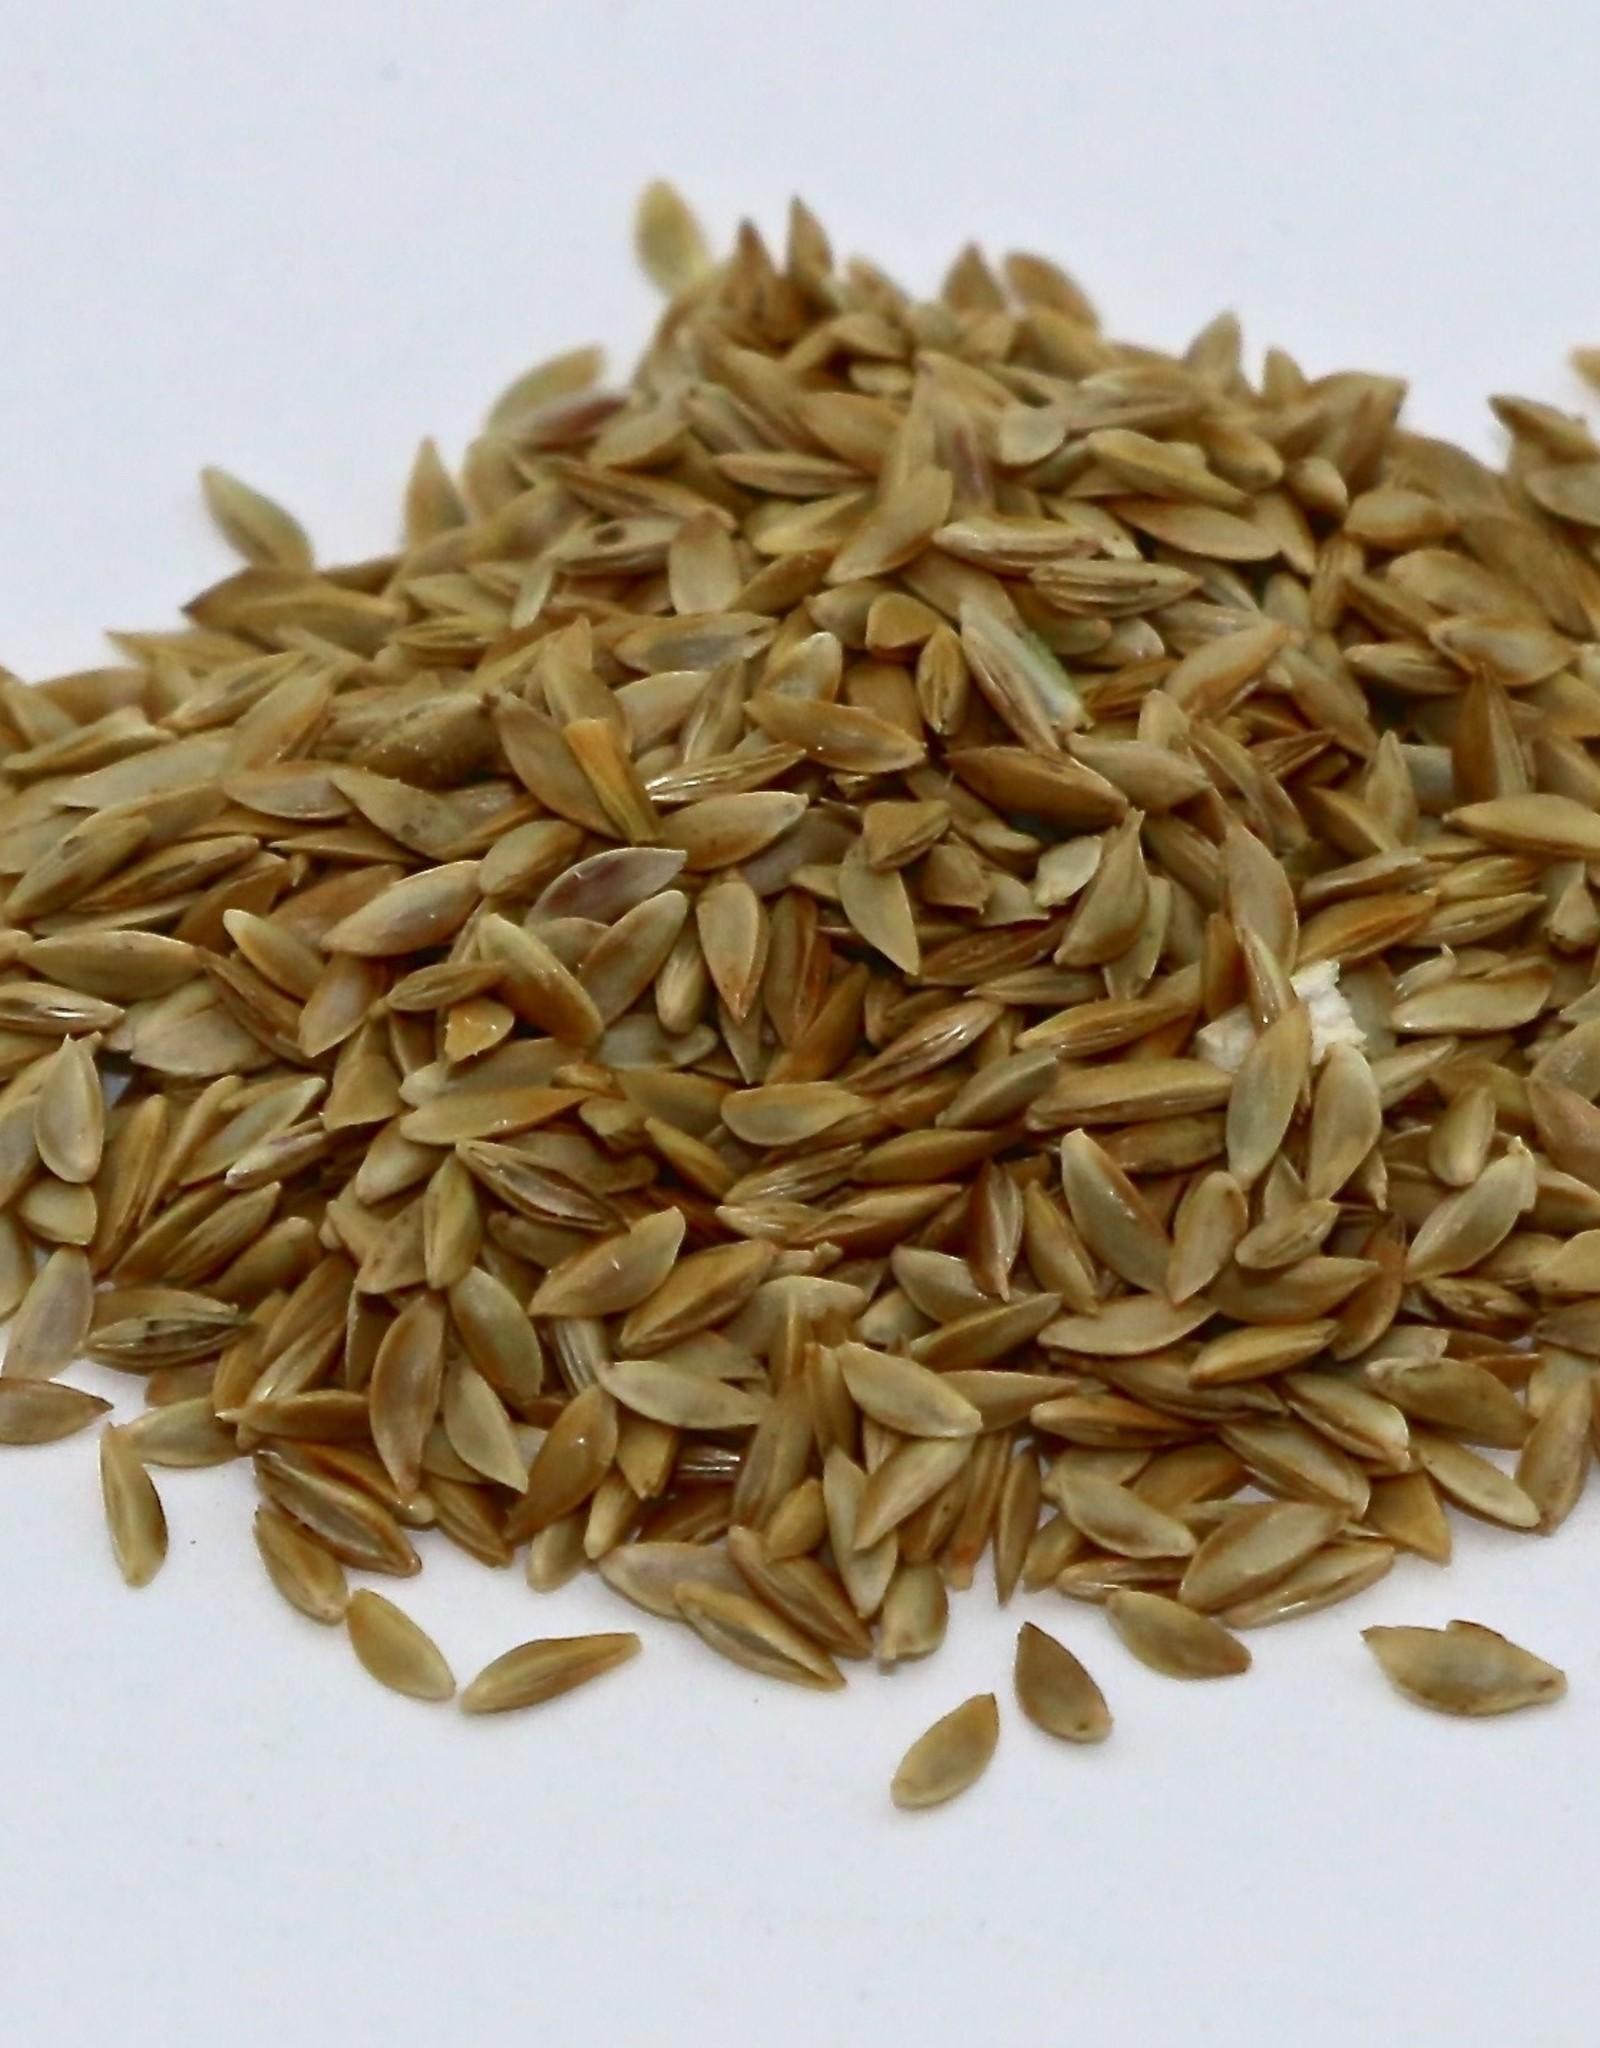 Raw Unhulled Bermuda Grass Seeds, 50 lb. Bag 50% more